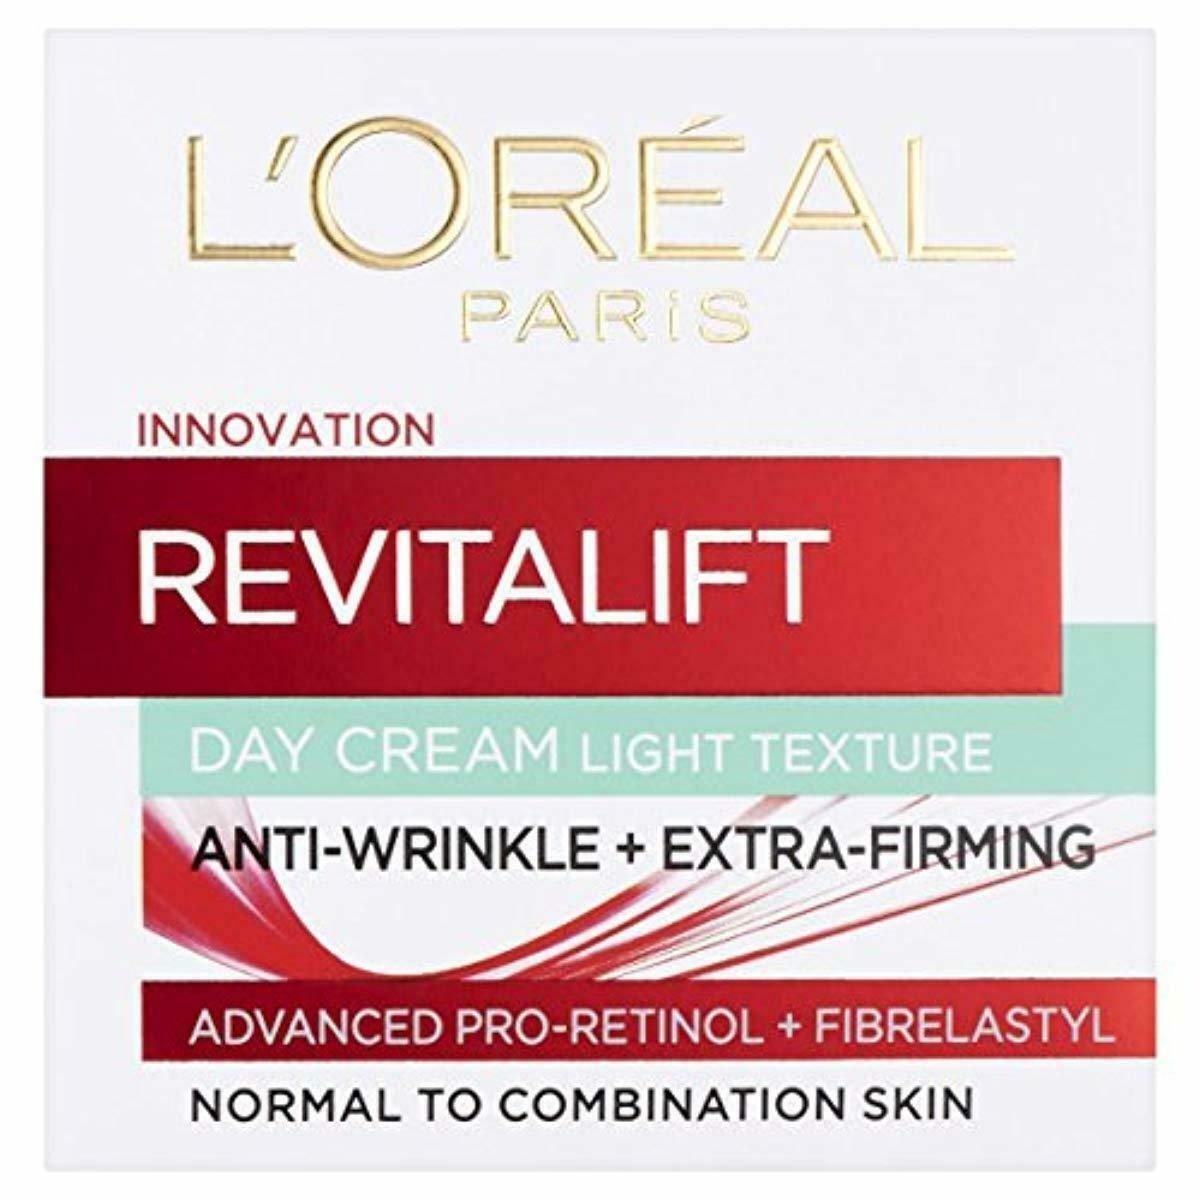 Loreal Paris Revitalift Classic Light Day Cream Αντιρυτιδική Κρέμα με Ελαφρία Υφή 50ml